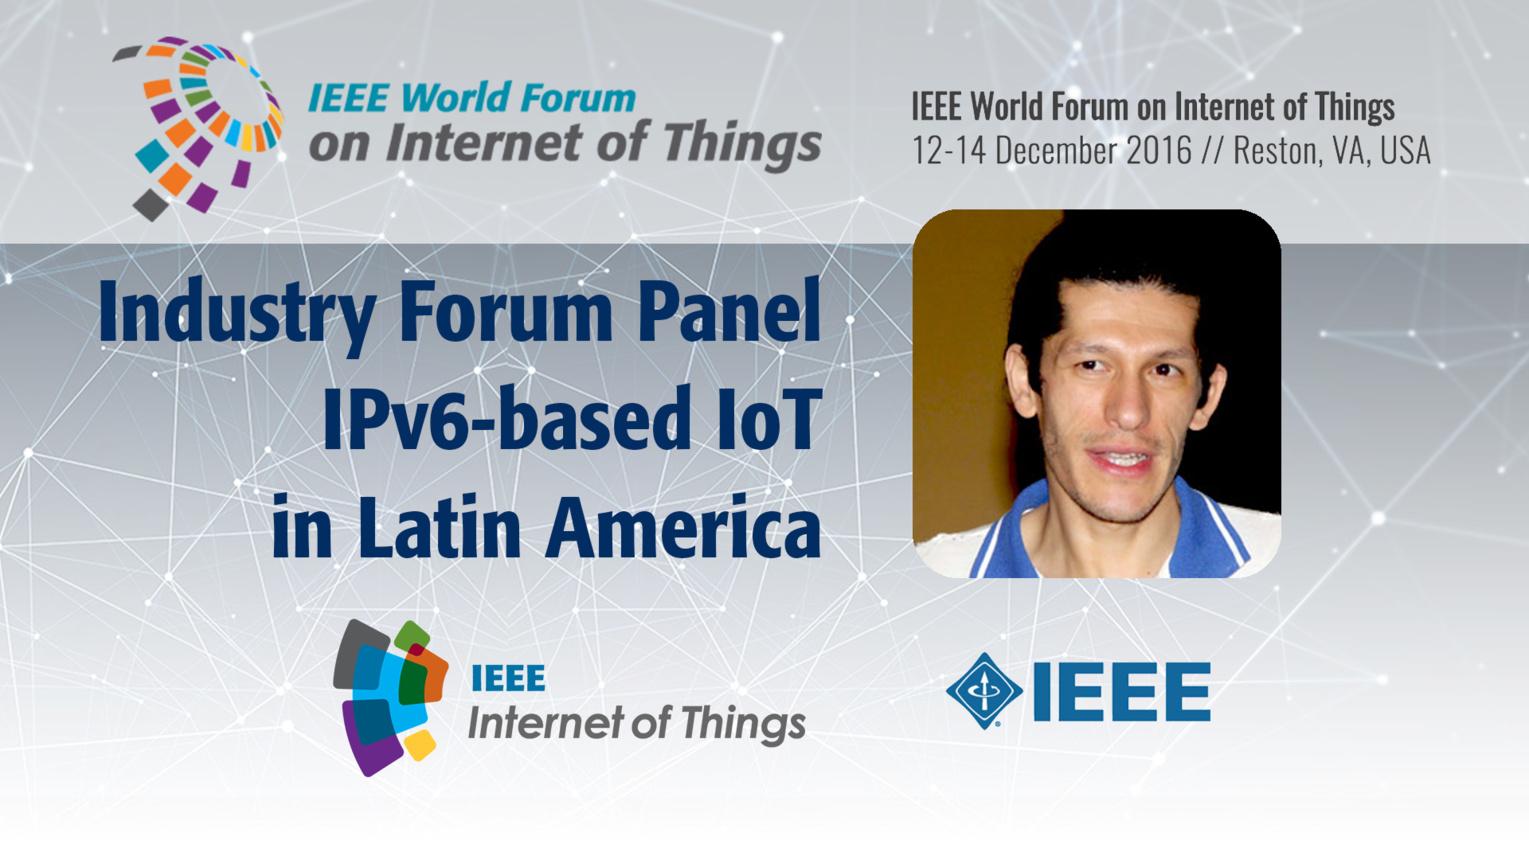 Azael Fernandez Alcantara: The Latin American Perspective - IPv6 Industry Forum Panel: WF IoT 2016